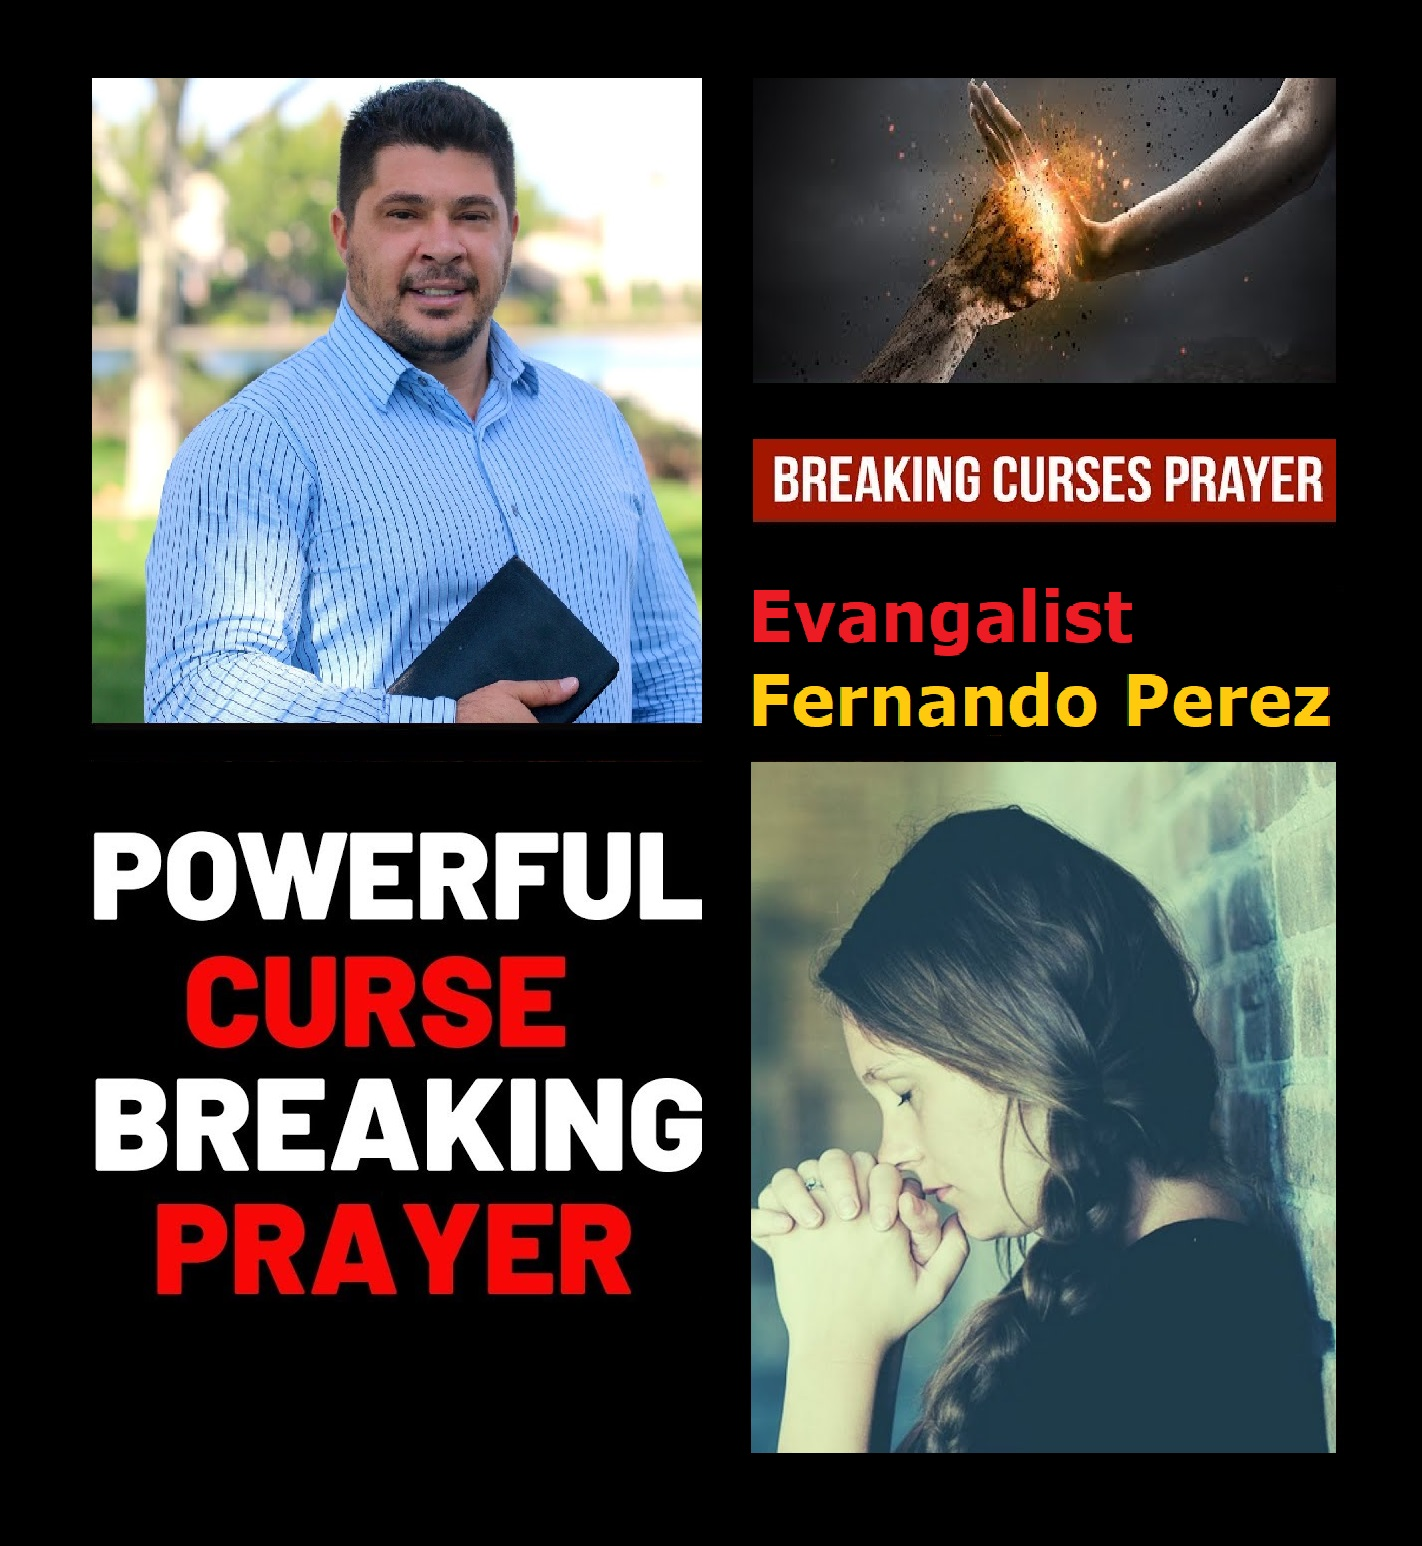 Evangalist Fernando Perez